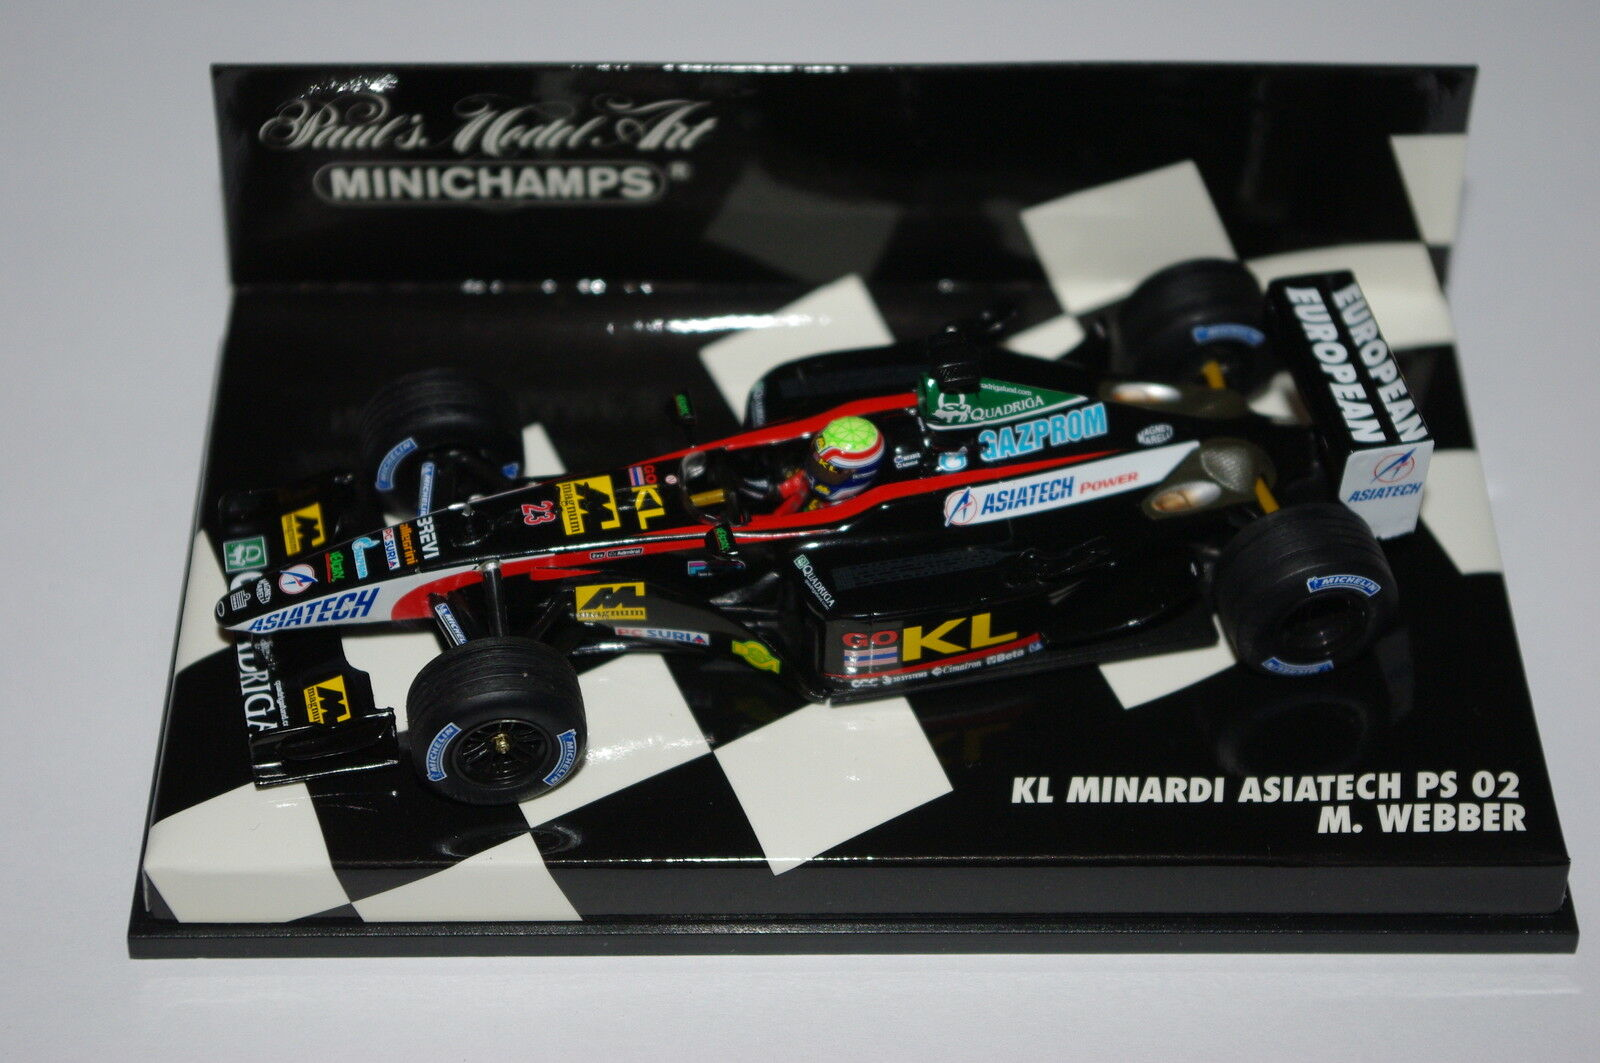 Minichamps F1 1  43 KL Minardi Asiatech PS 02 Mark Webber  bienvenue à choisir